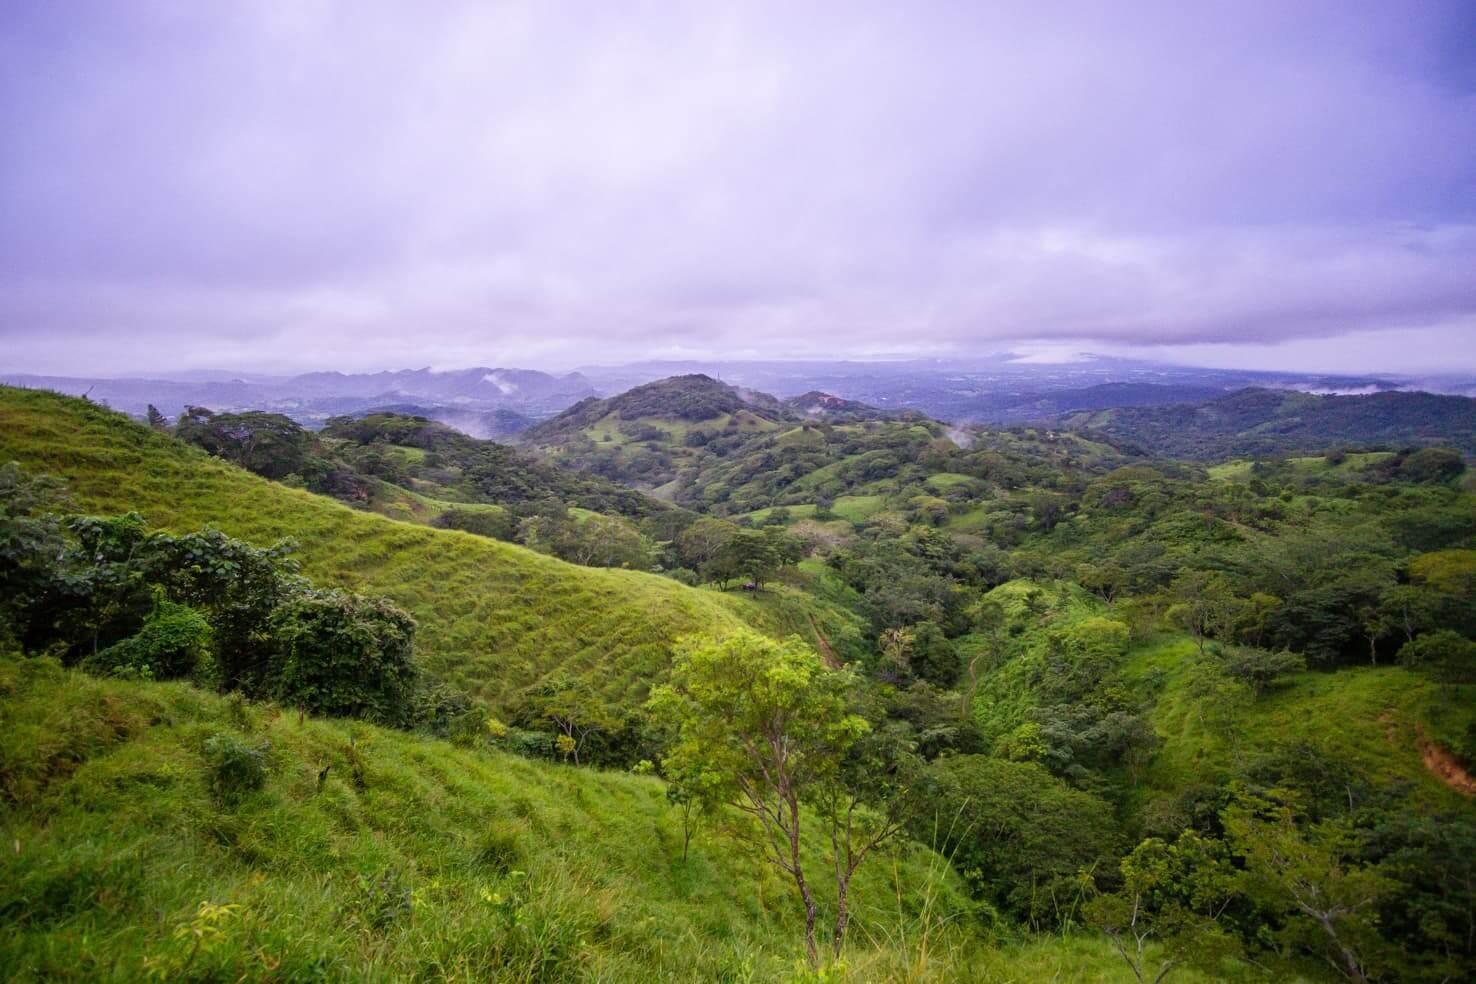 10 days in Costa Rica - Monteverde